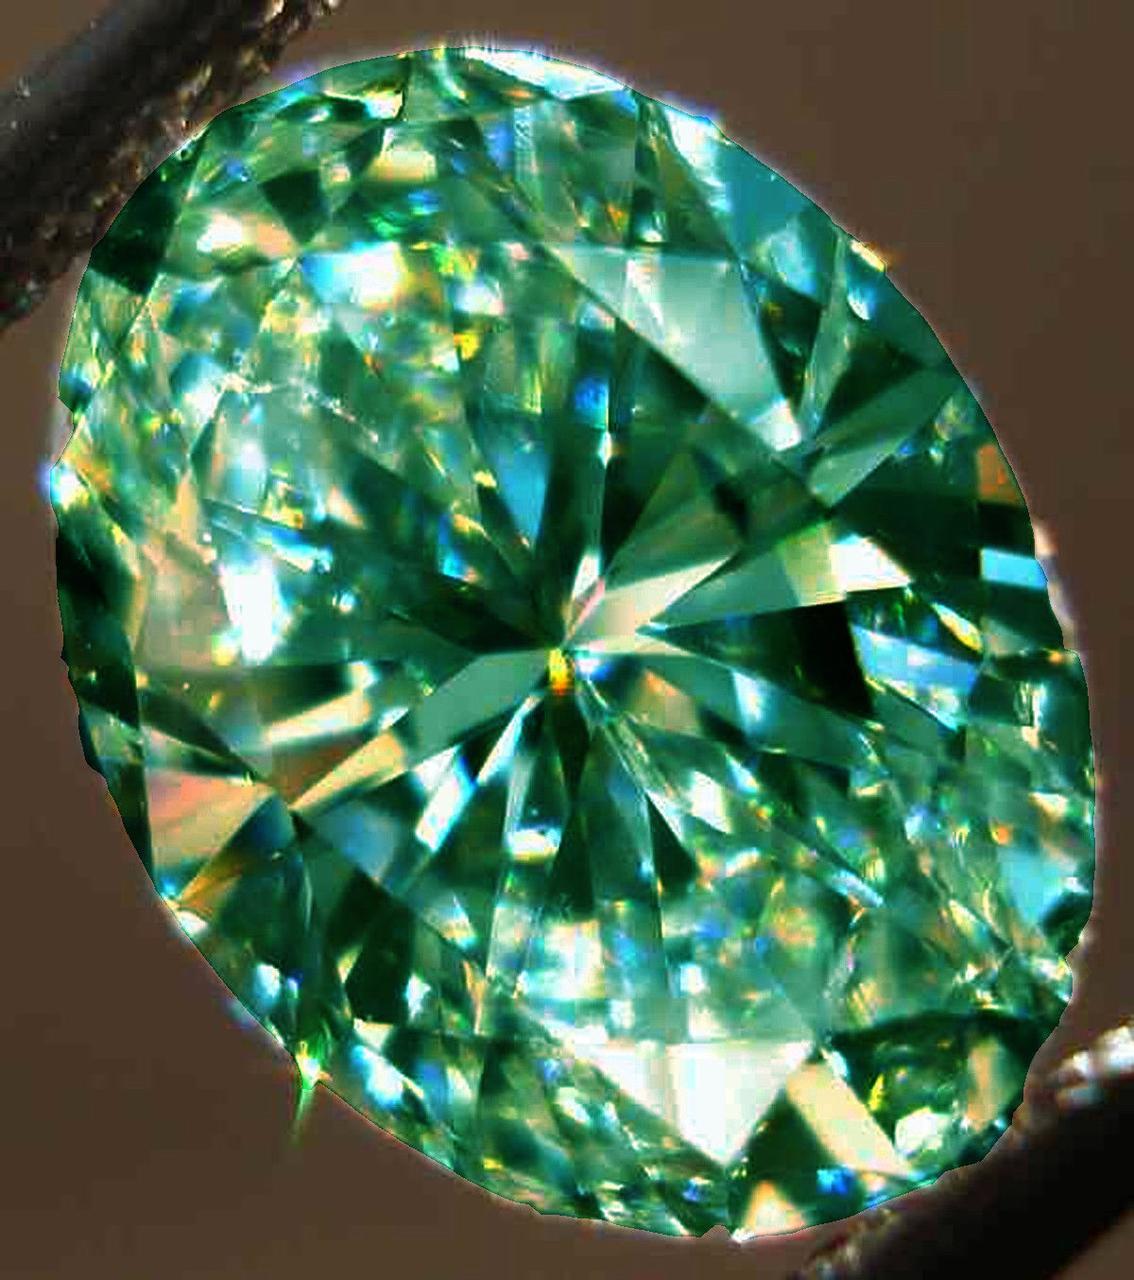 Діамант - Муассанит 5.02 ct VVS1 9.10 х 11.75 мм